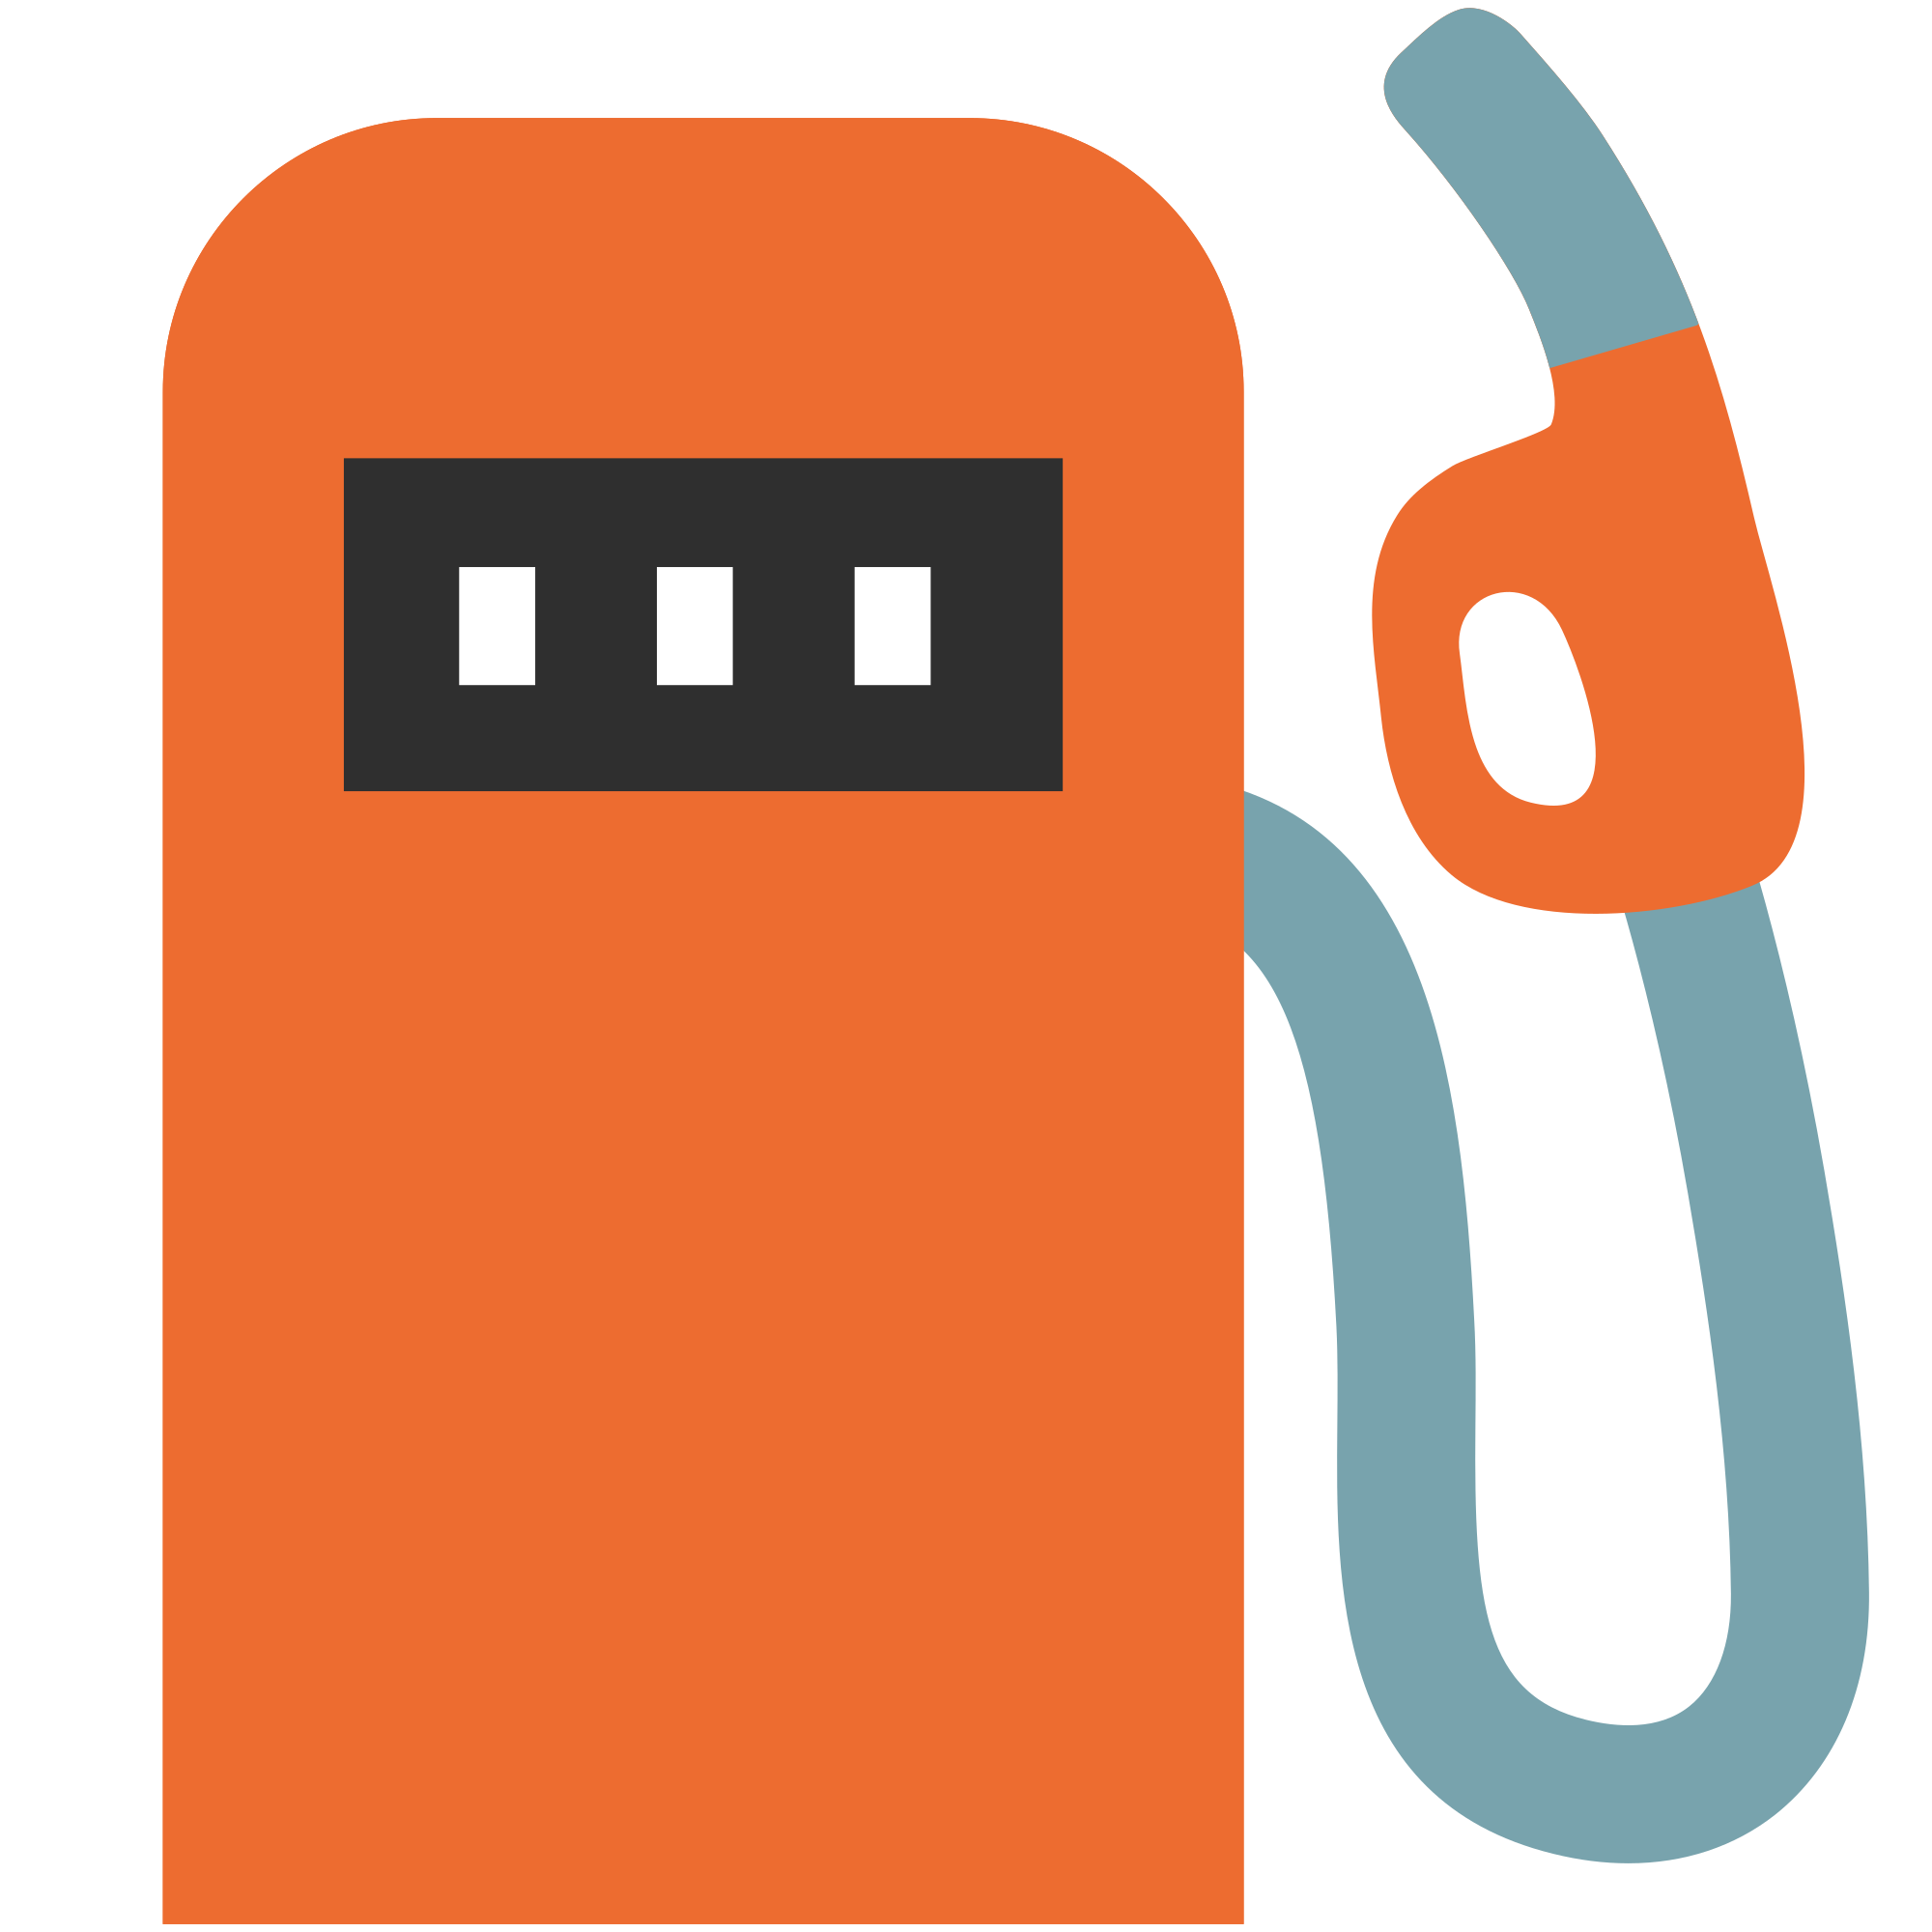 Fuel petrol png images. Gas clipart petroleum product